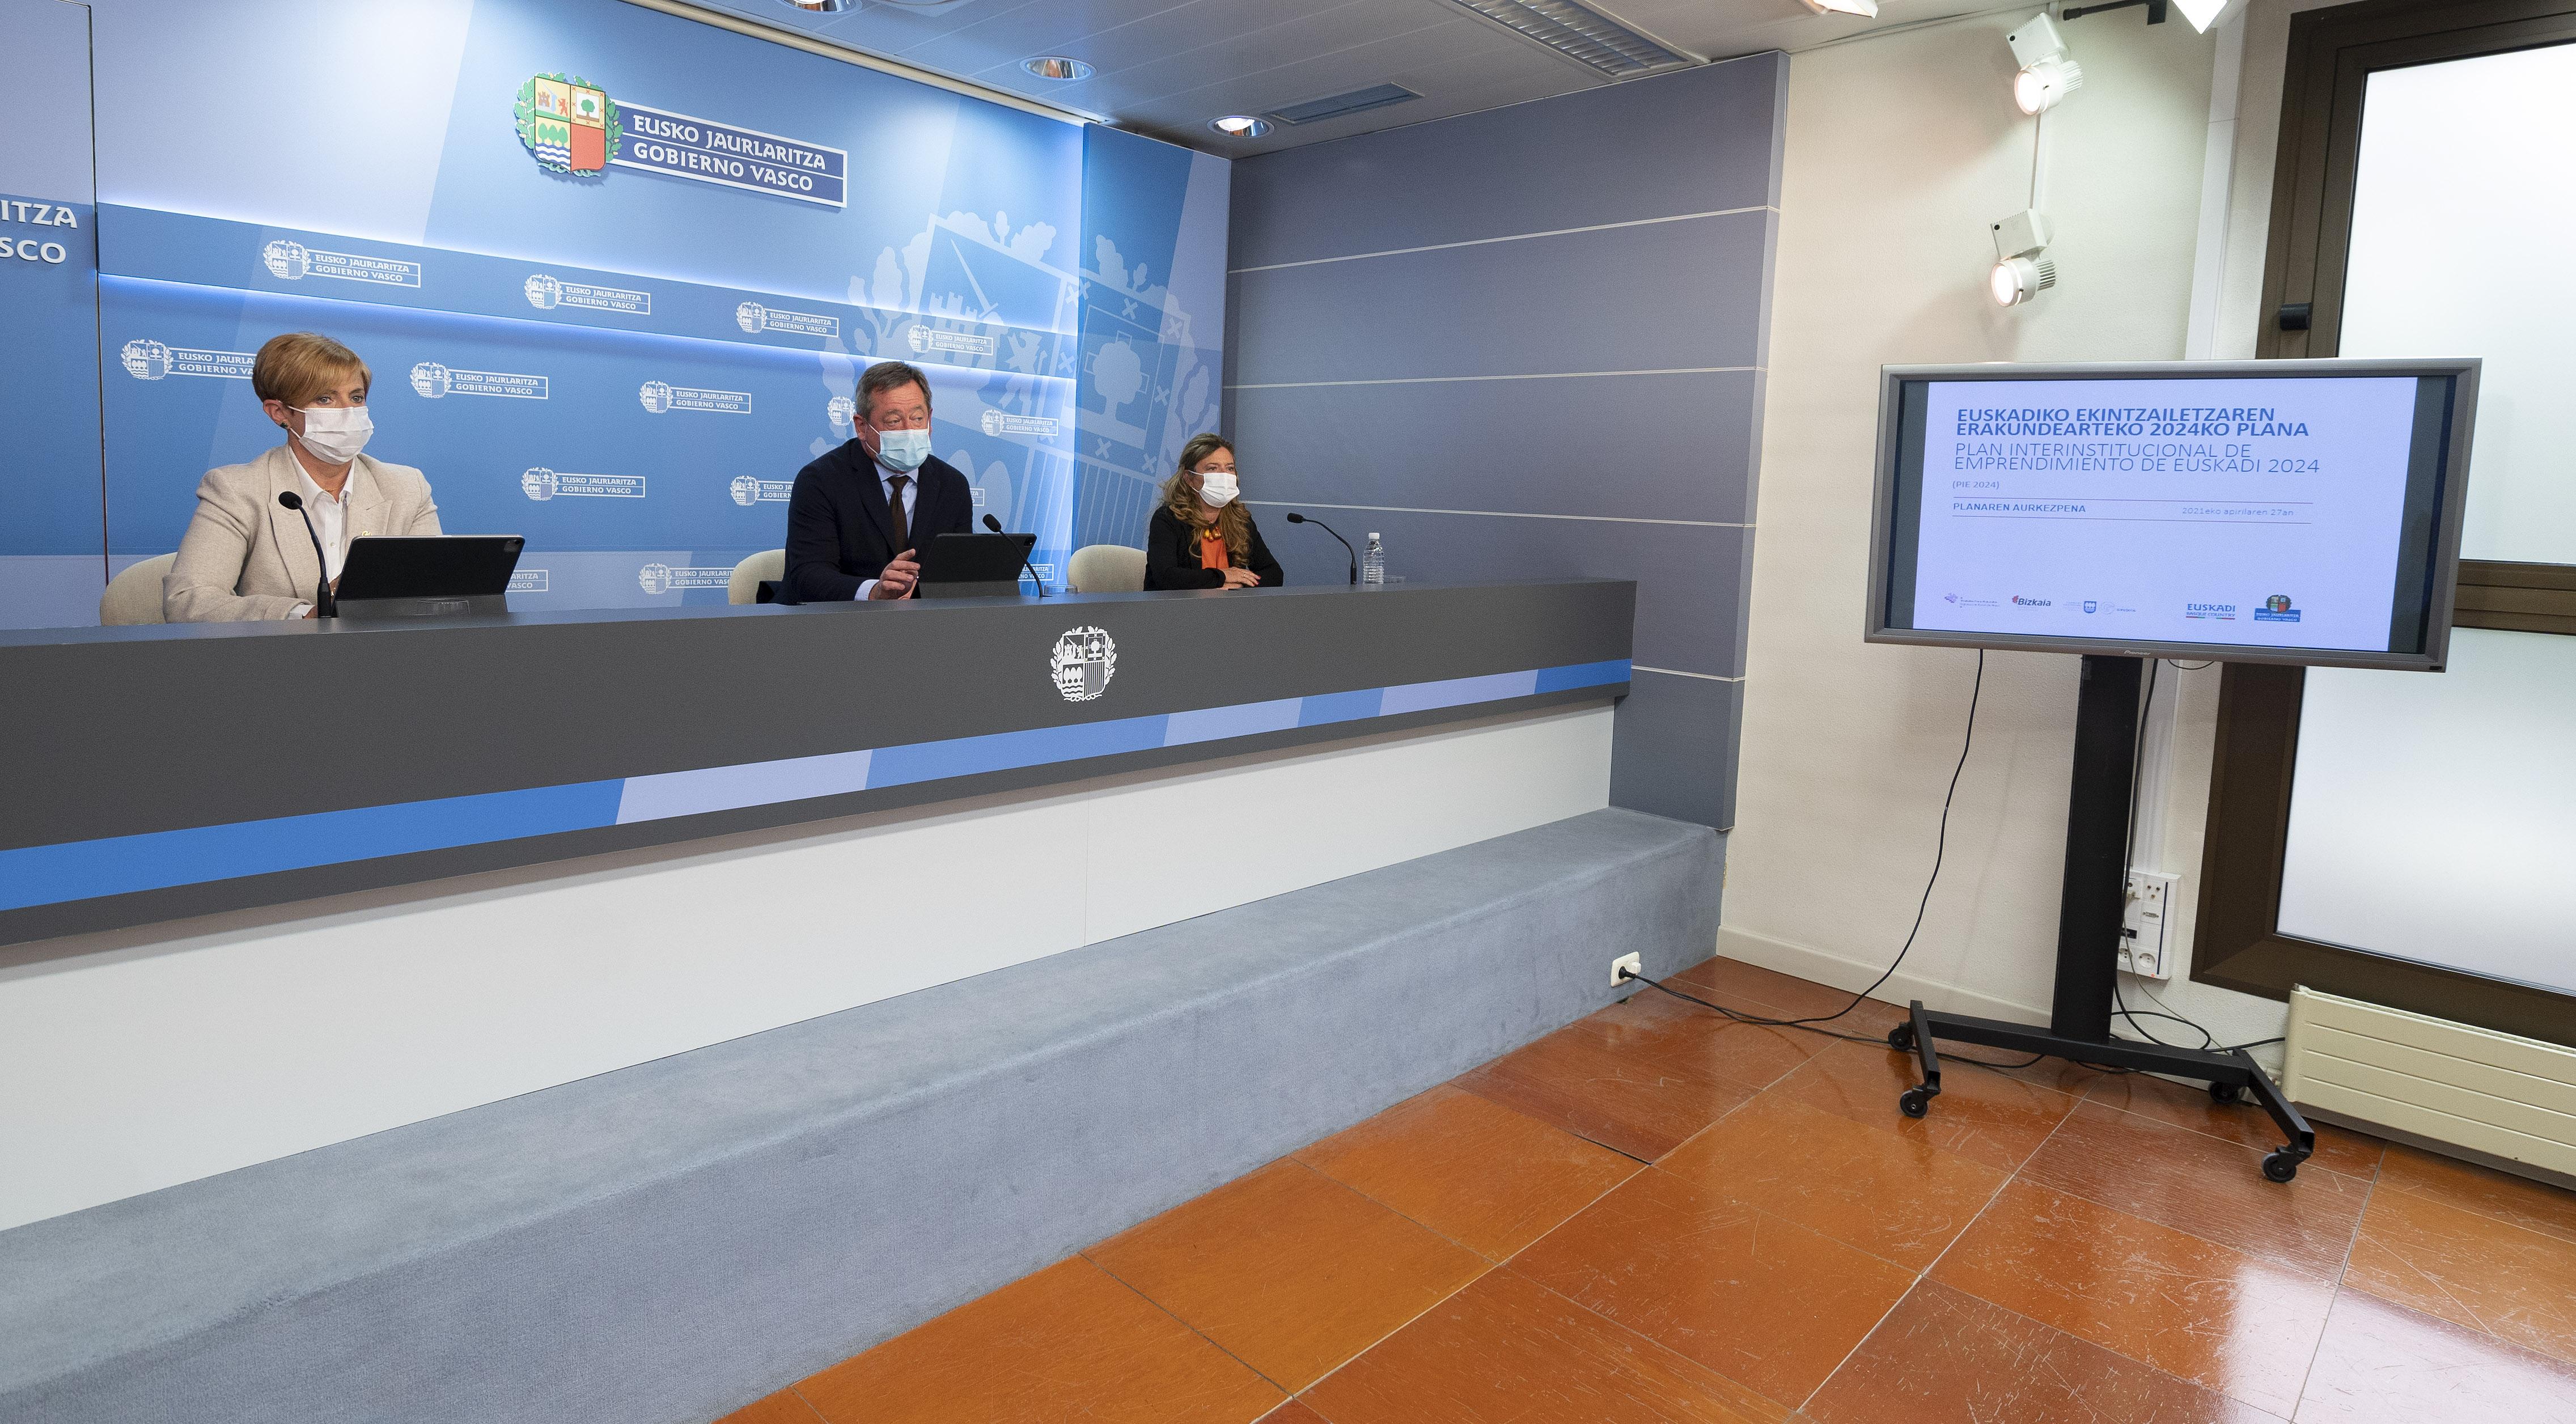 2021_04_27_consejo_gobierno_07.jpg